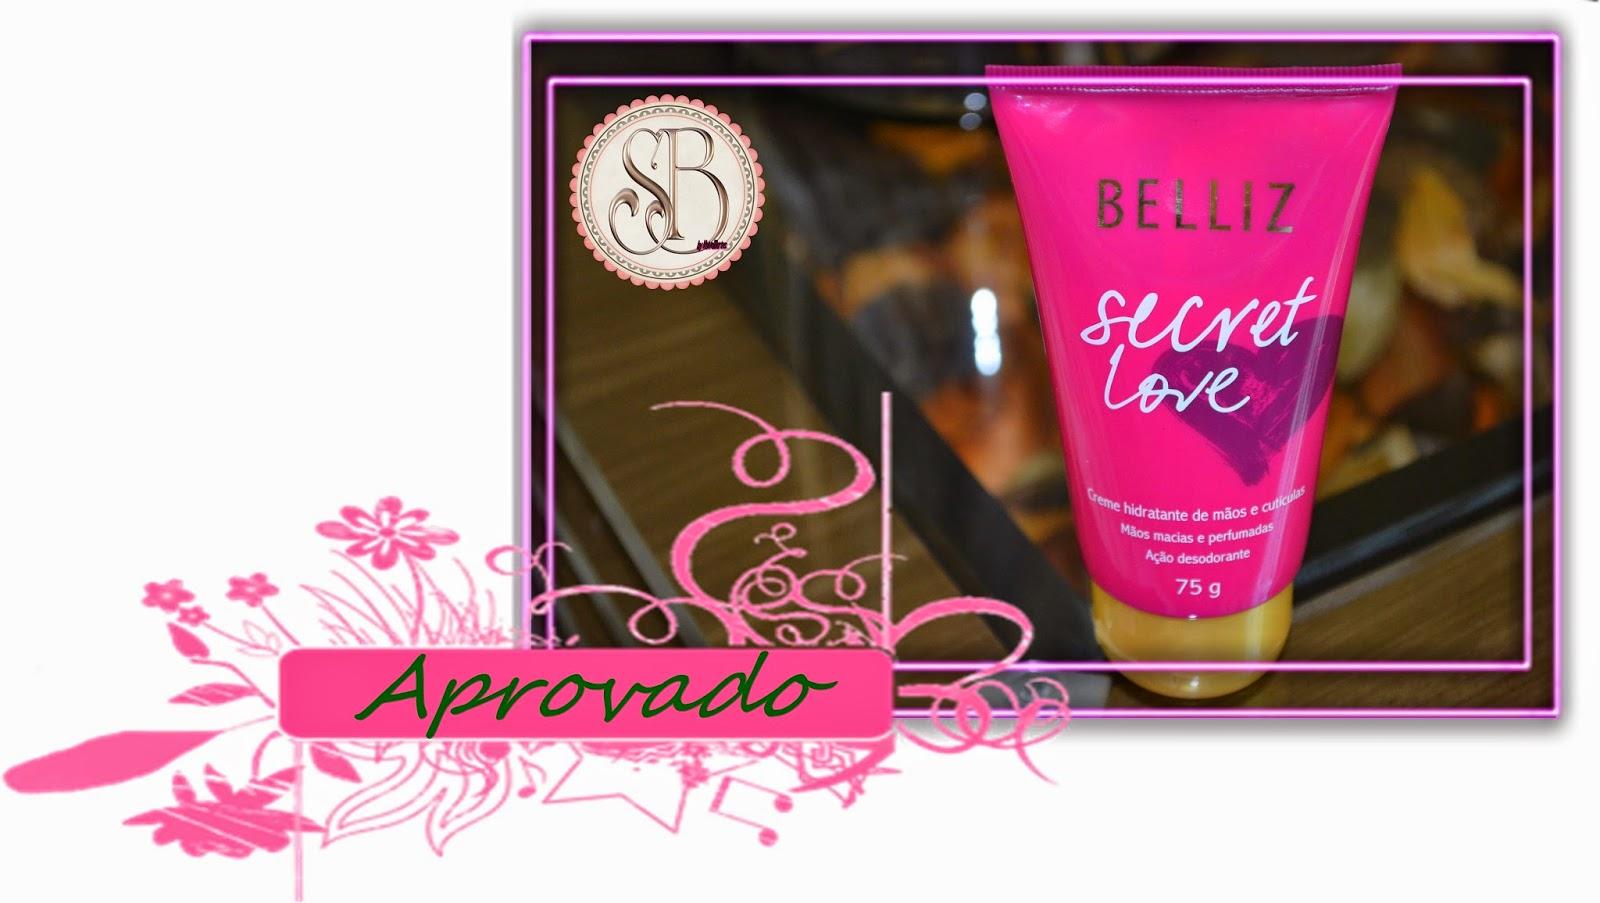 Somando Beleza, Neiva Marins, Creme de Mãos Secret Love Belliz